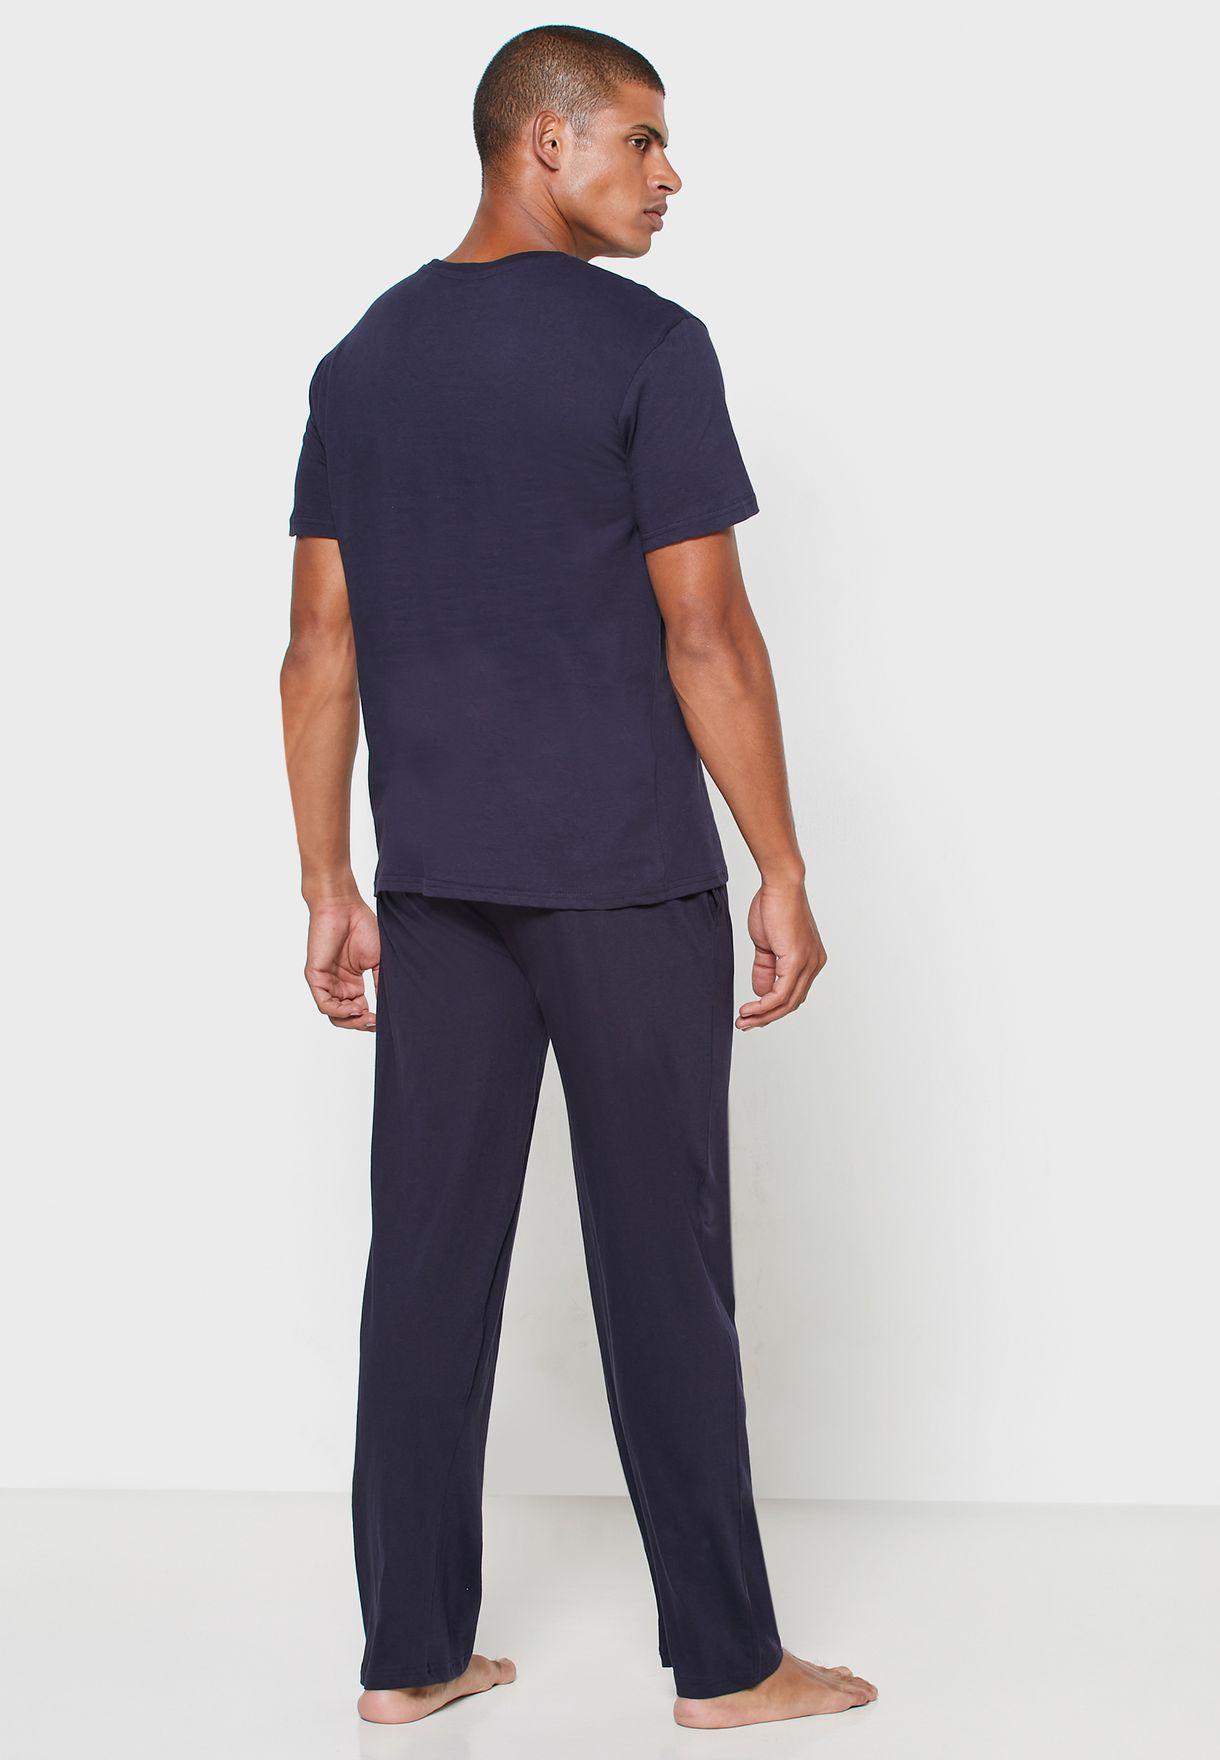 Slogan Crew Neck T Shirt  + Pants Set